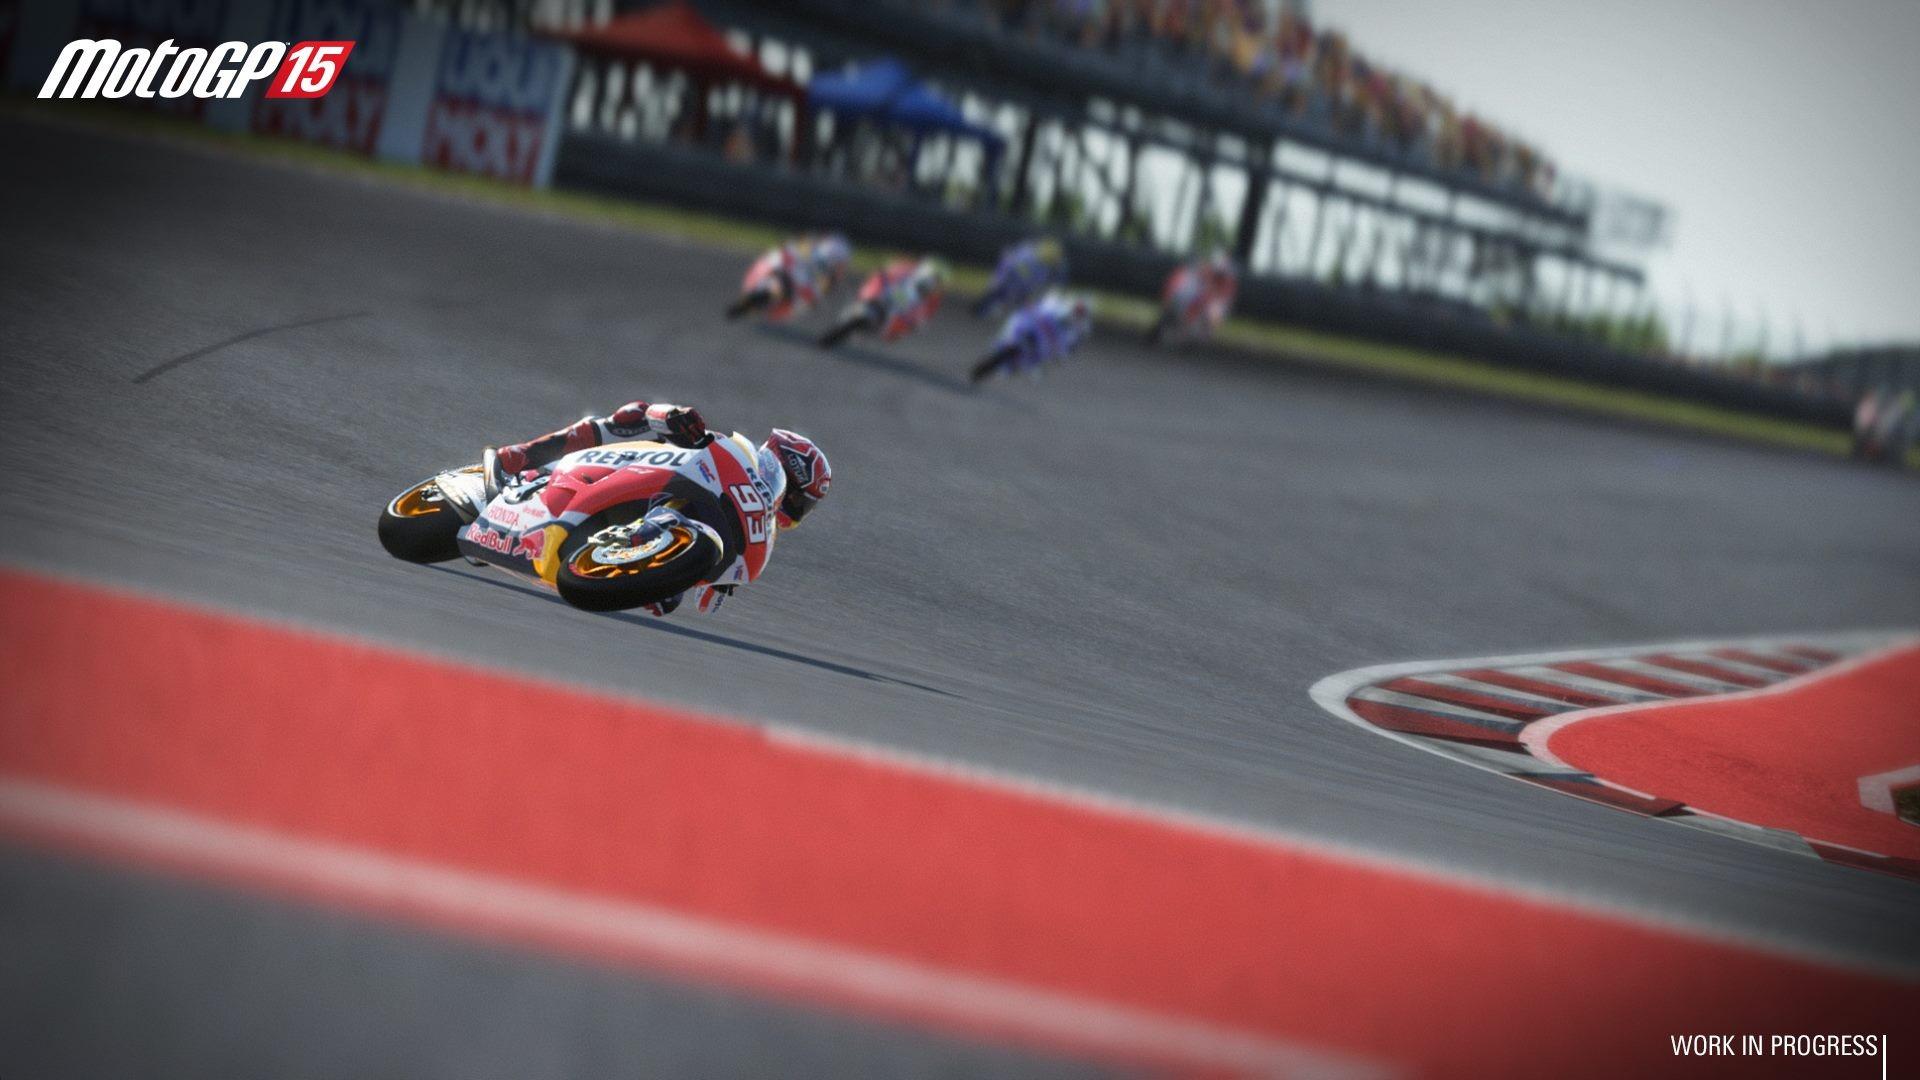 MotoGP 15 Screenshot #4 for PS4 - Operation Sports